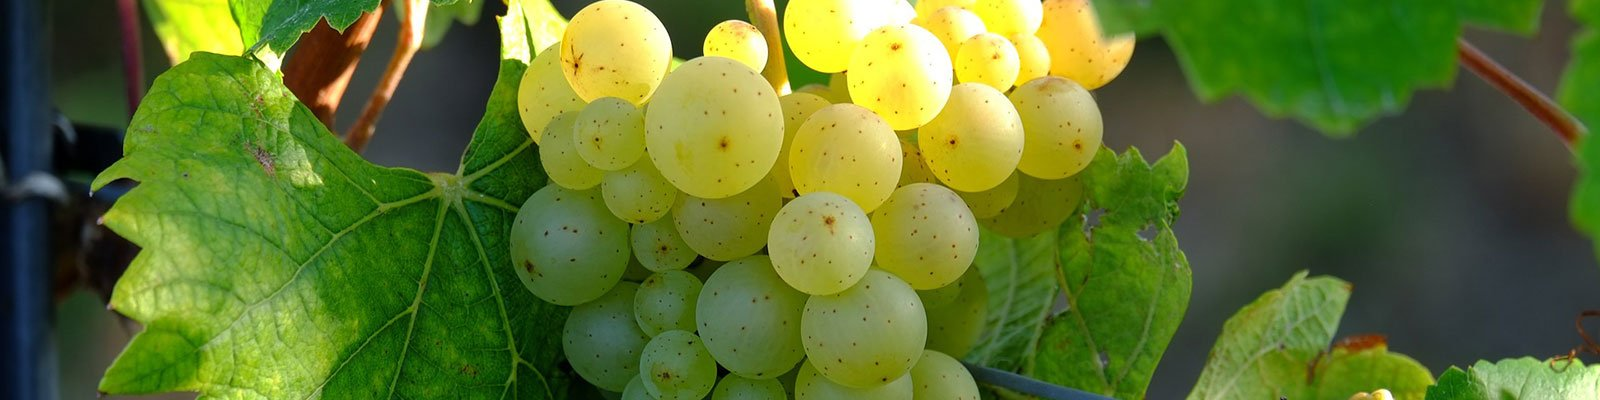 WSET Level 3 | The Wine & Spirit Education Trust